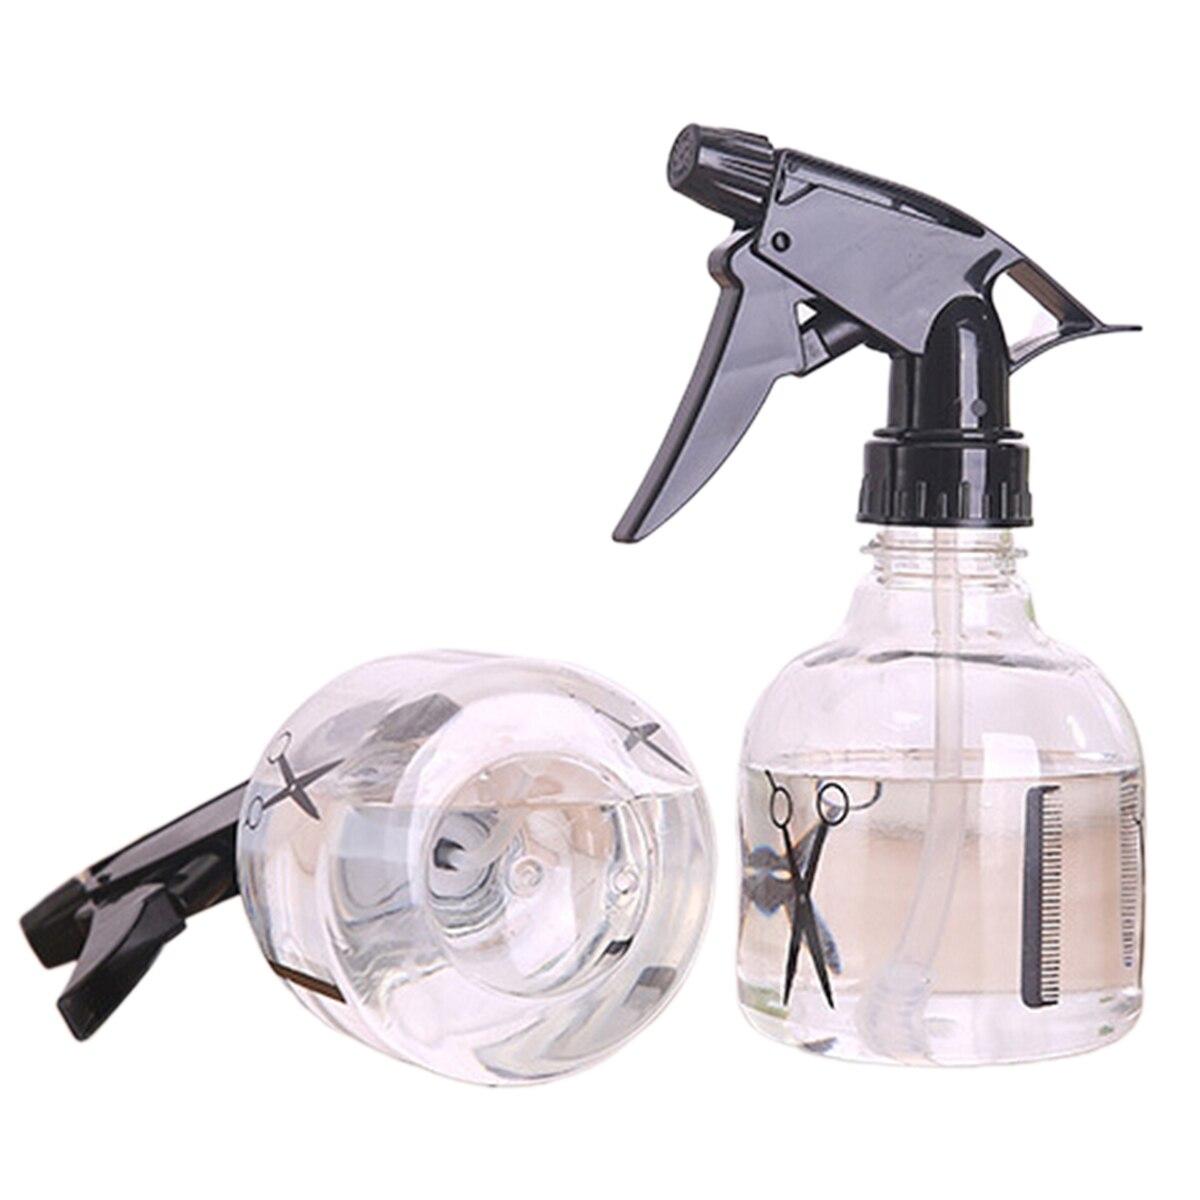 1pc 250ml Travel Empty Spray Bottle Transparent Plastic Perfume Atomizer Sprayers For Hairstyling Garden Moisturizing